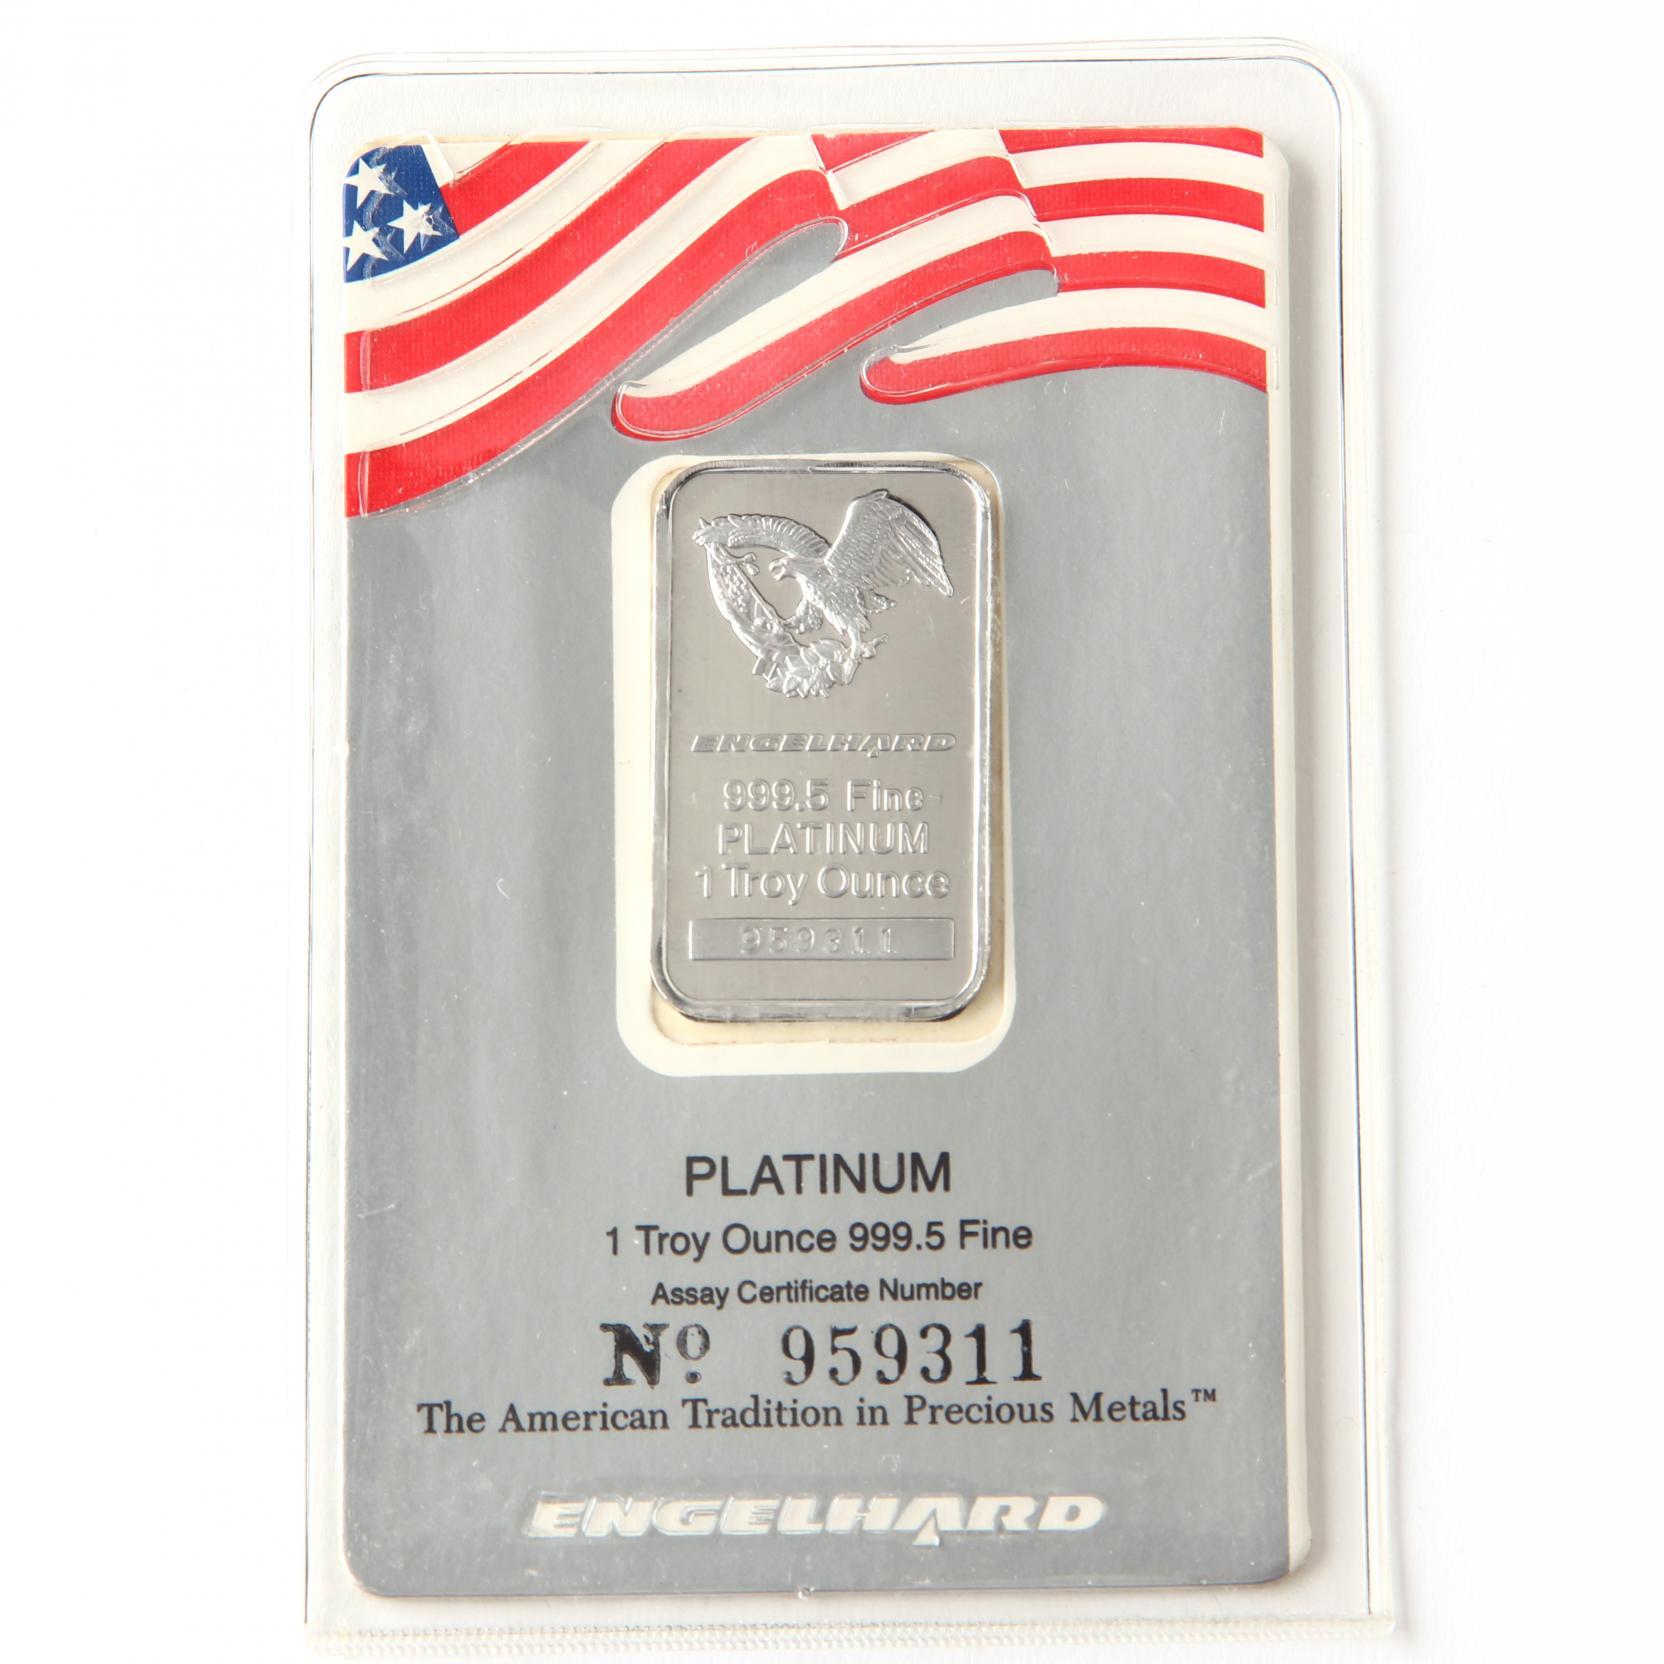 engelhard-1-troy-ounce-of-999-5-fine-platinum